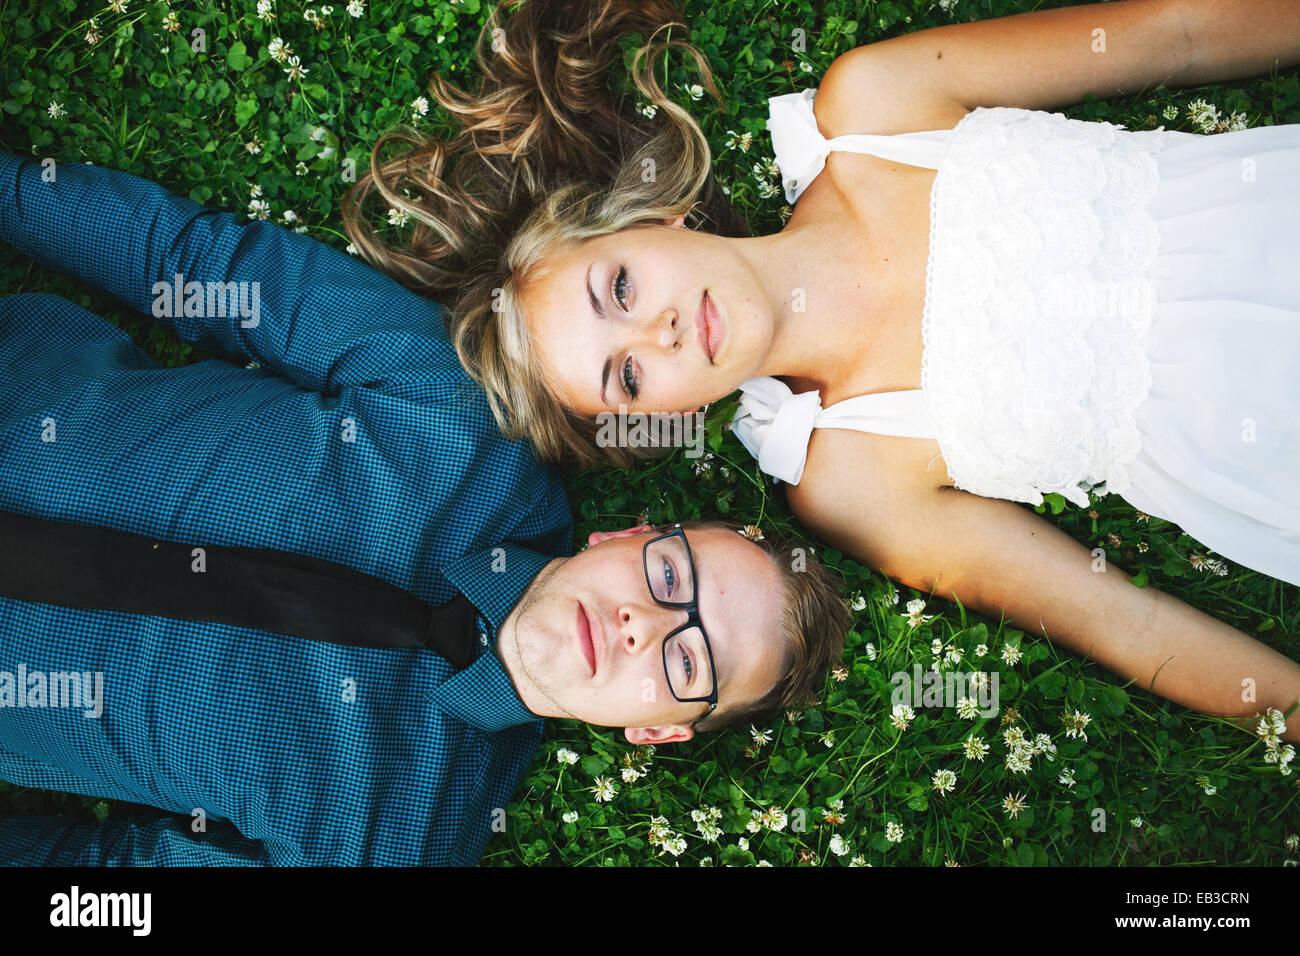 USA (Minnesota), Comté de Hennepin, Minneapolis, Overhead view of young woman lying on grass Photo Stock